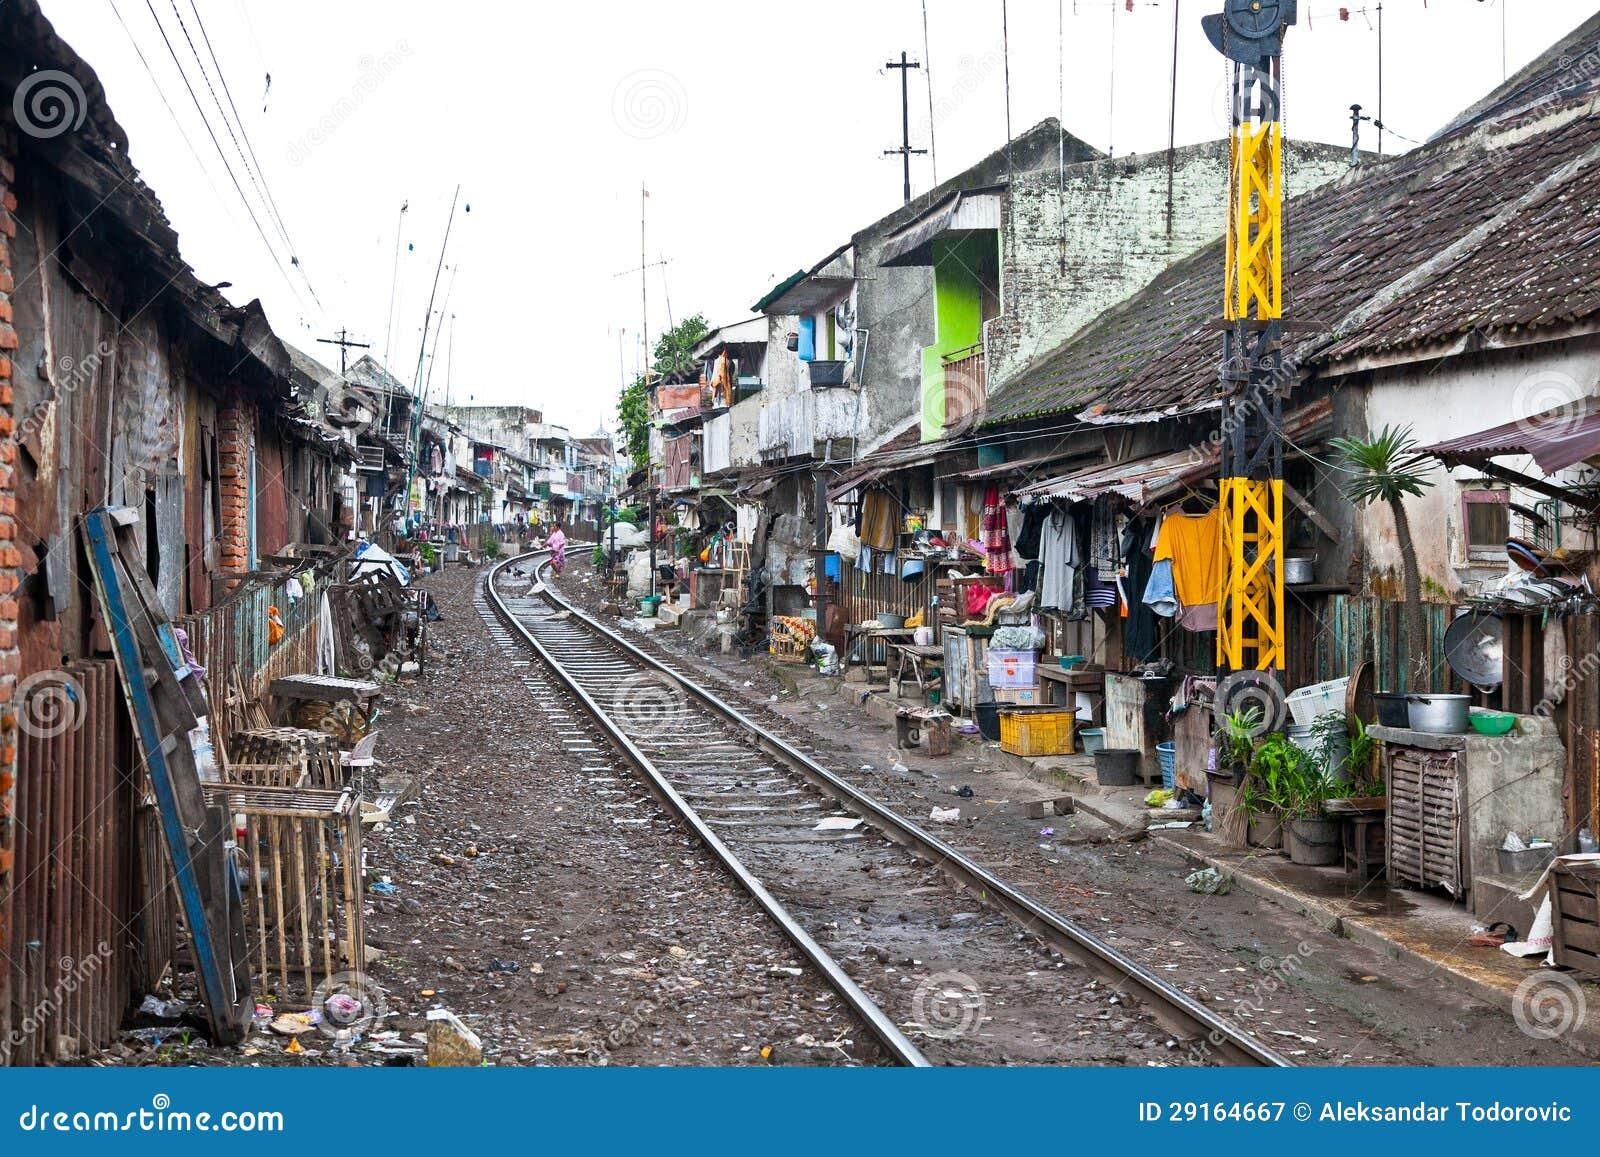 Unidentified fattigt folk som bor i slumen, Indonesien.